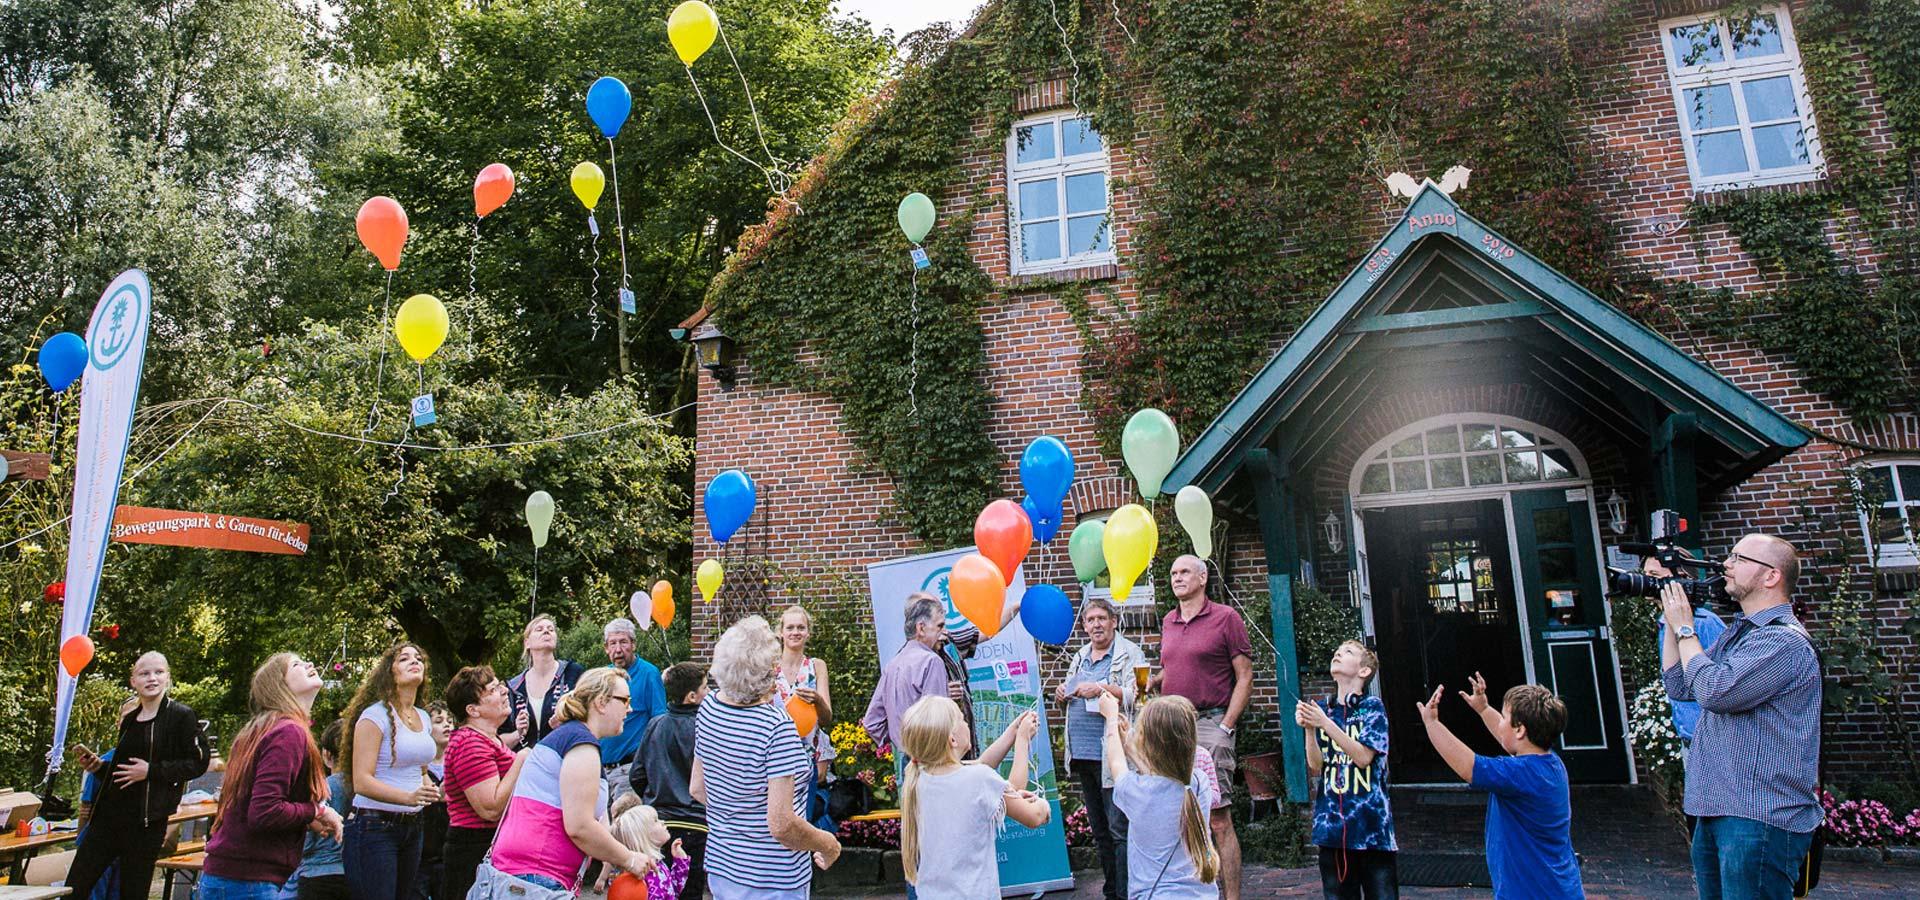 Mieterfest 2017 in der Ruscherei Altengroden